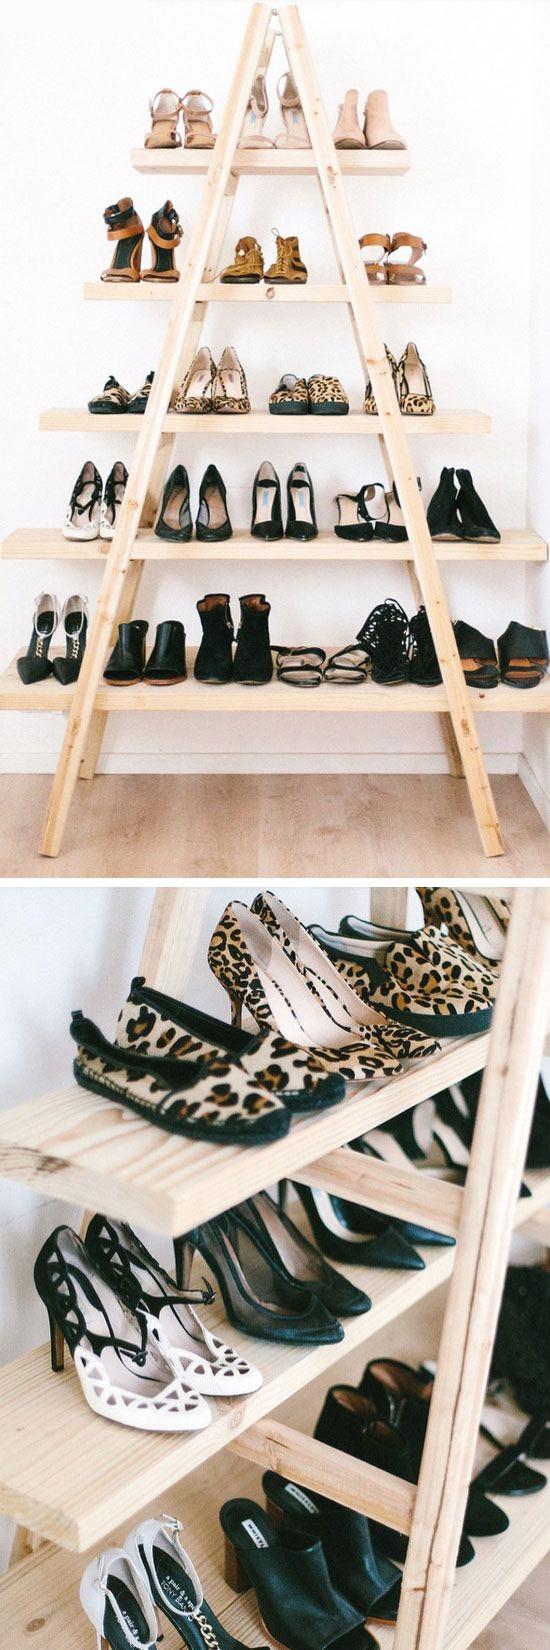 22 chaos eliminating diy shoe rack ideas